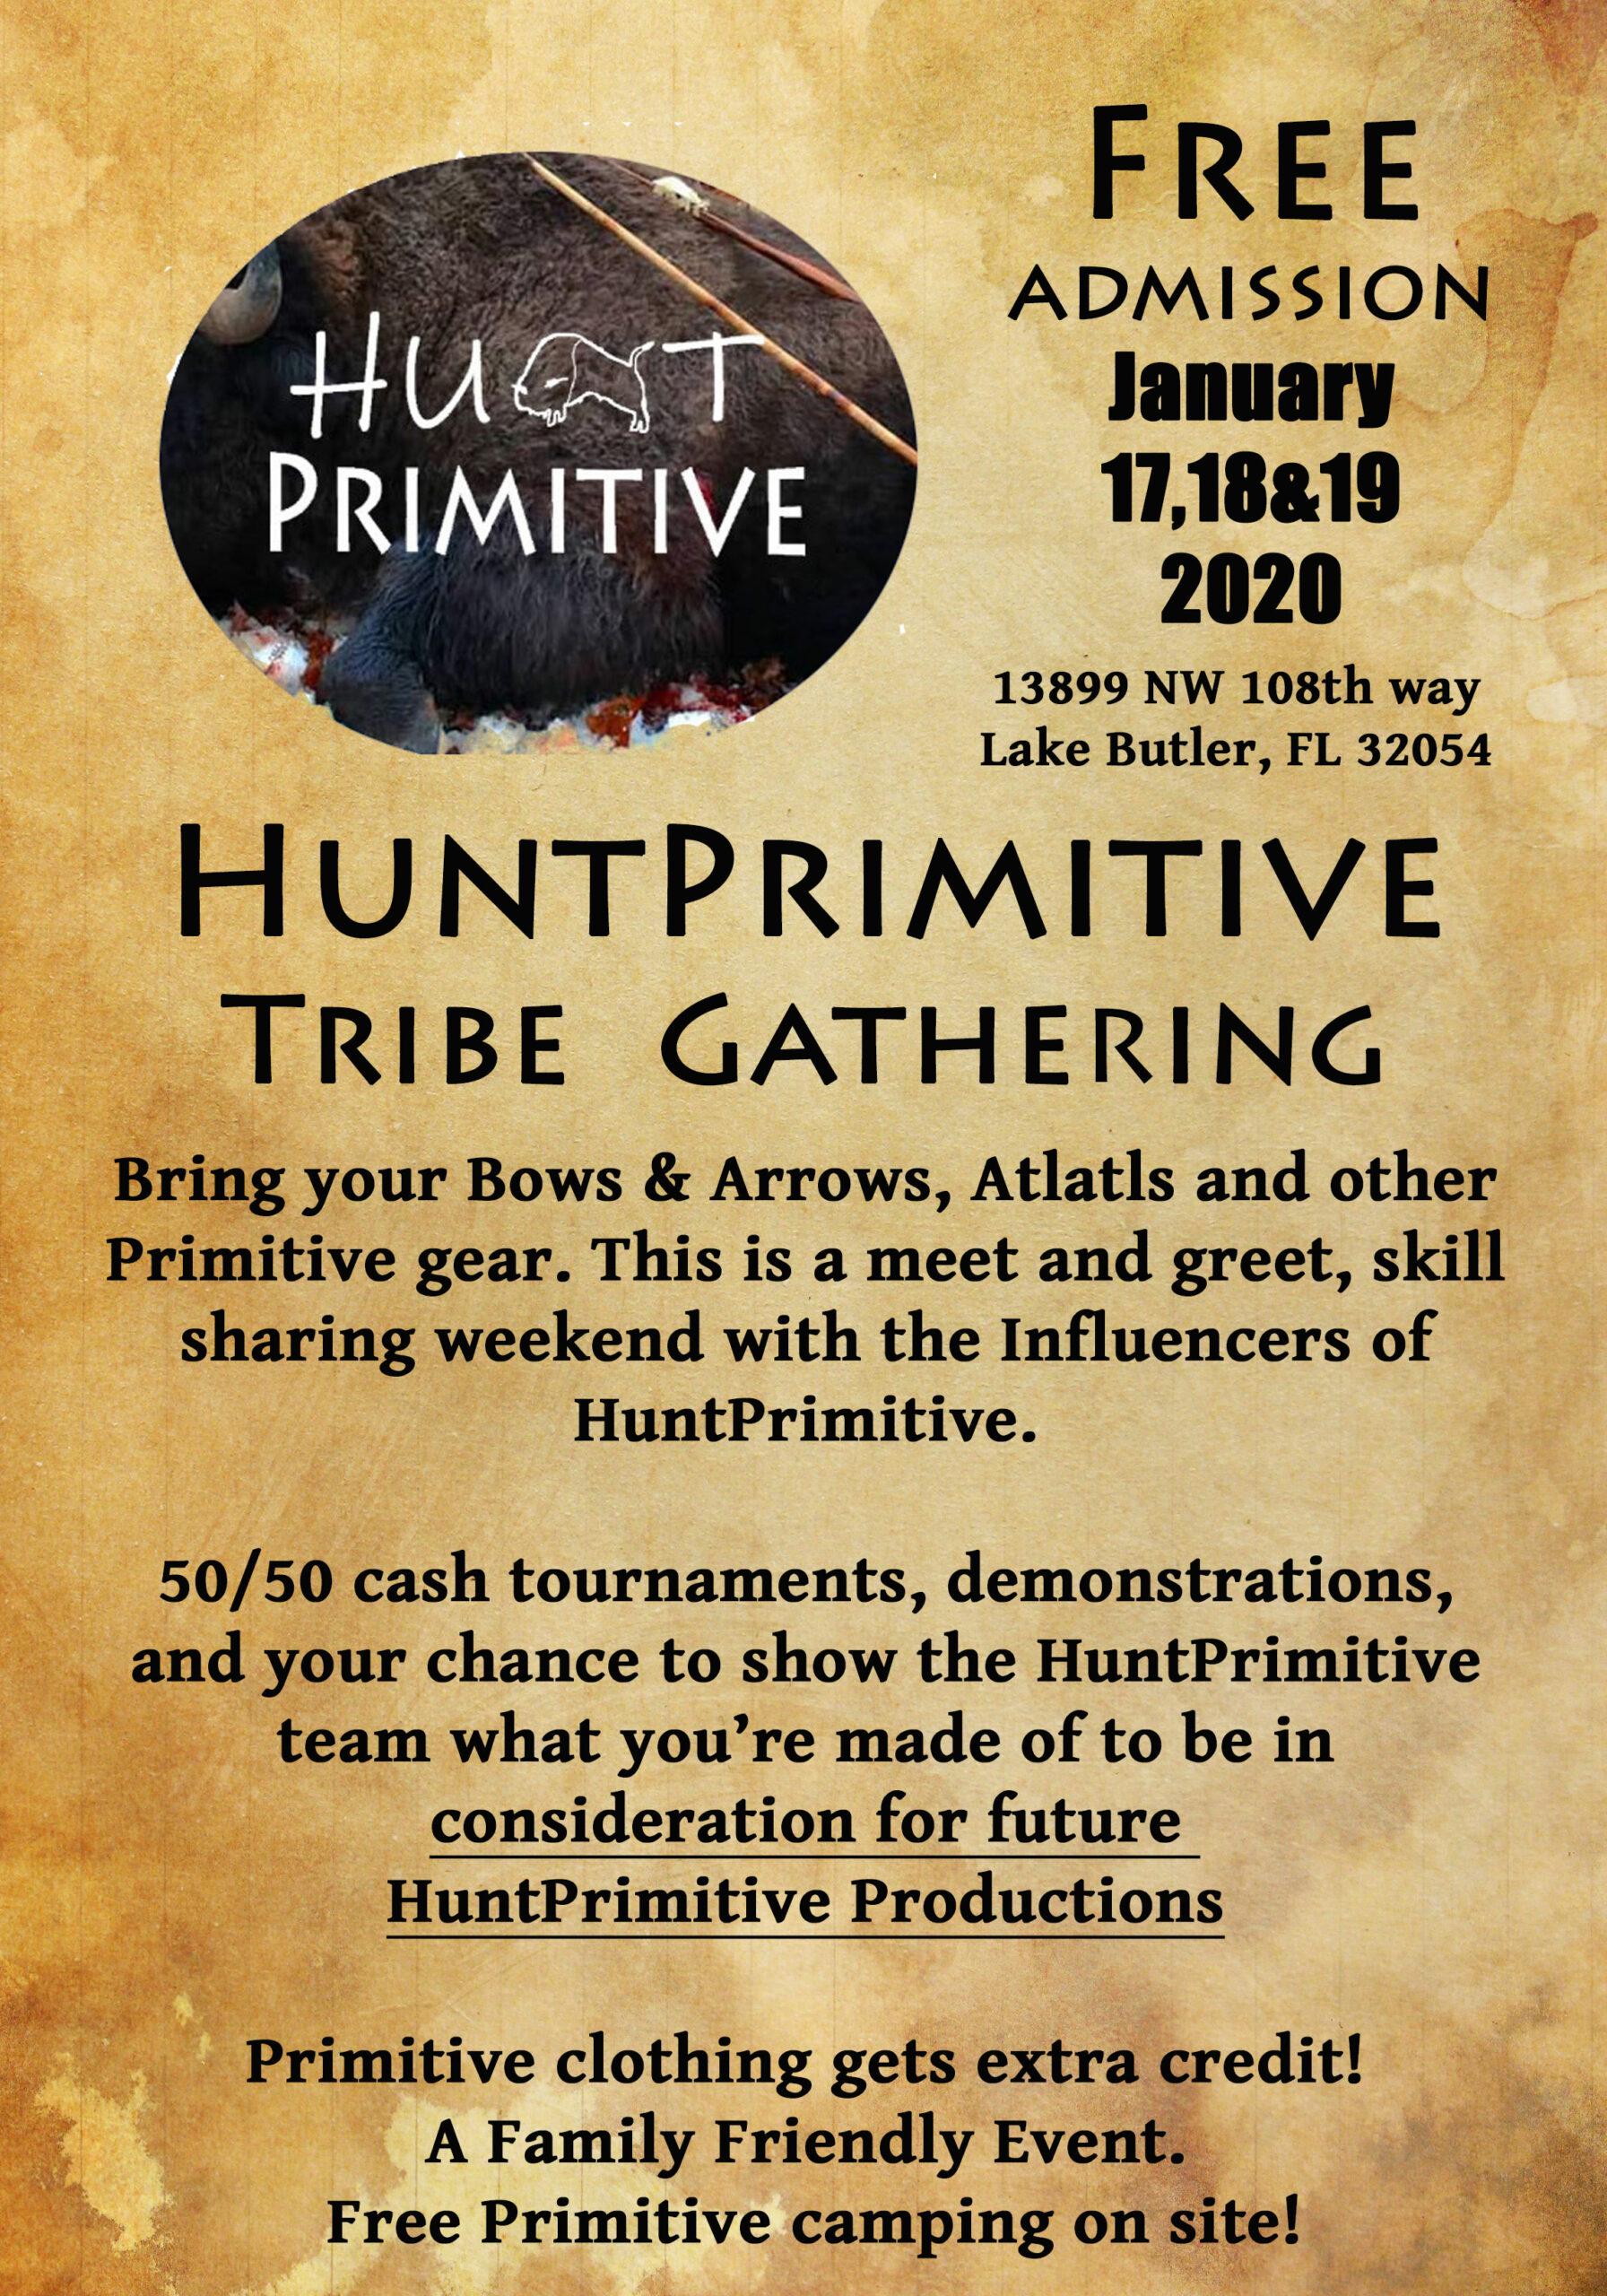 HuntPrimitive-Gathering